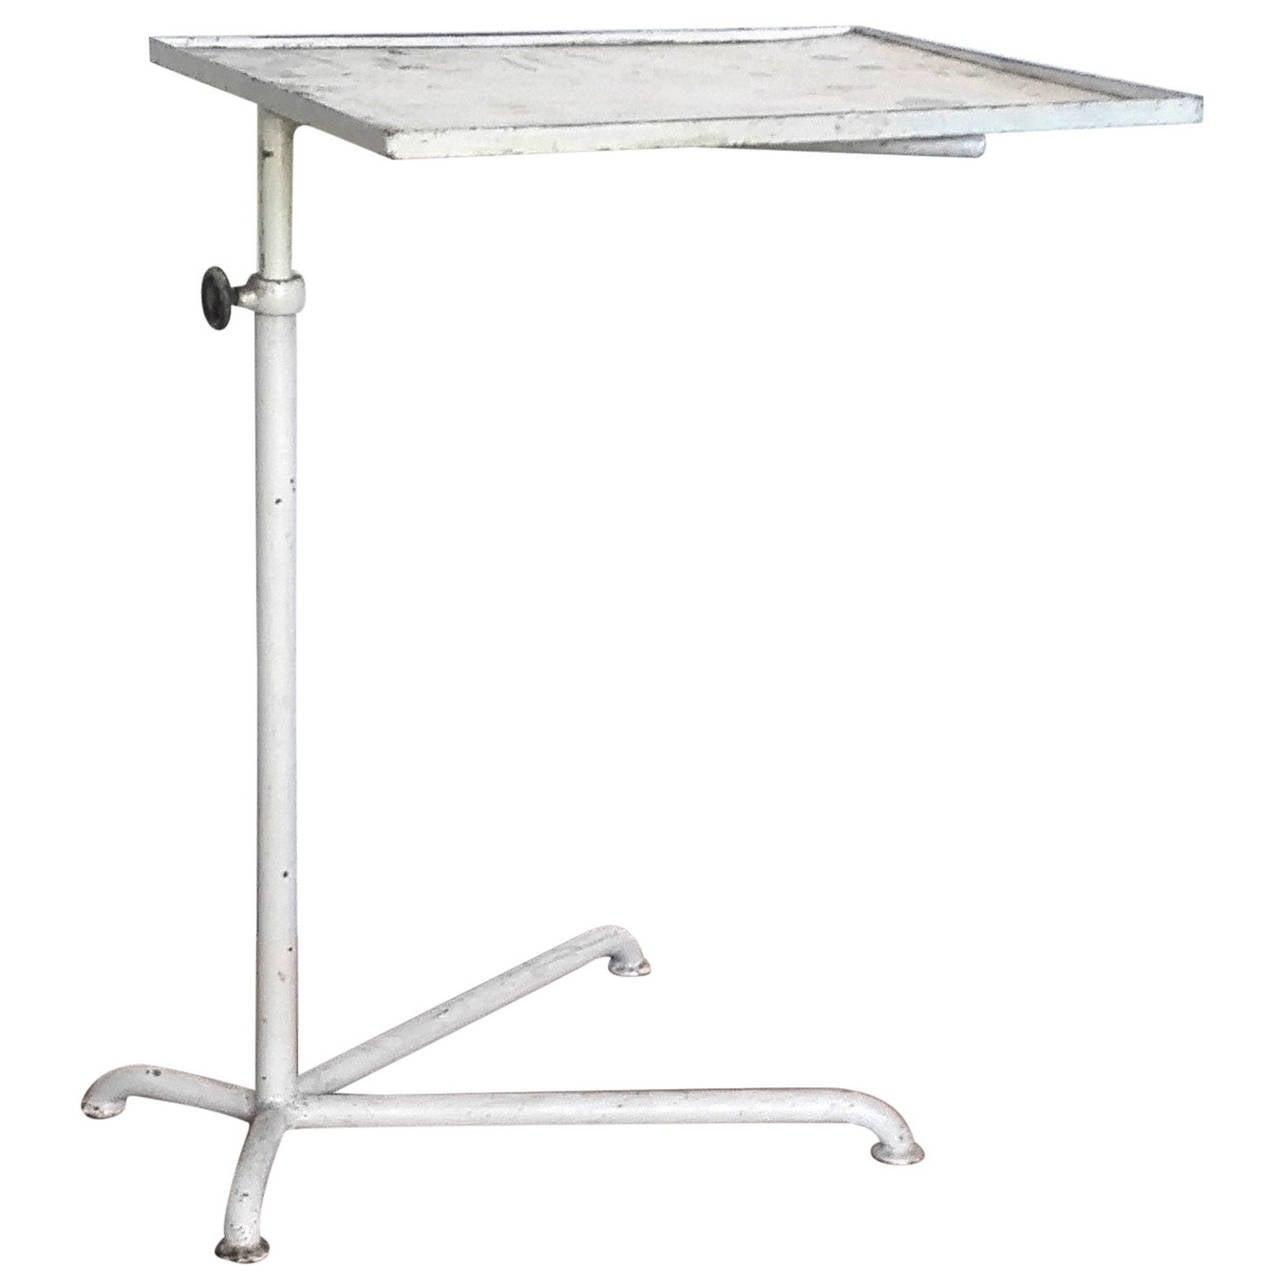 Minimalist industrial adjustable side table france 1950s for sale